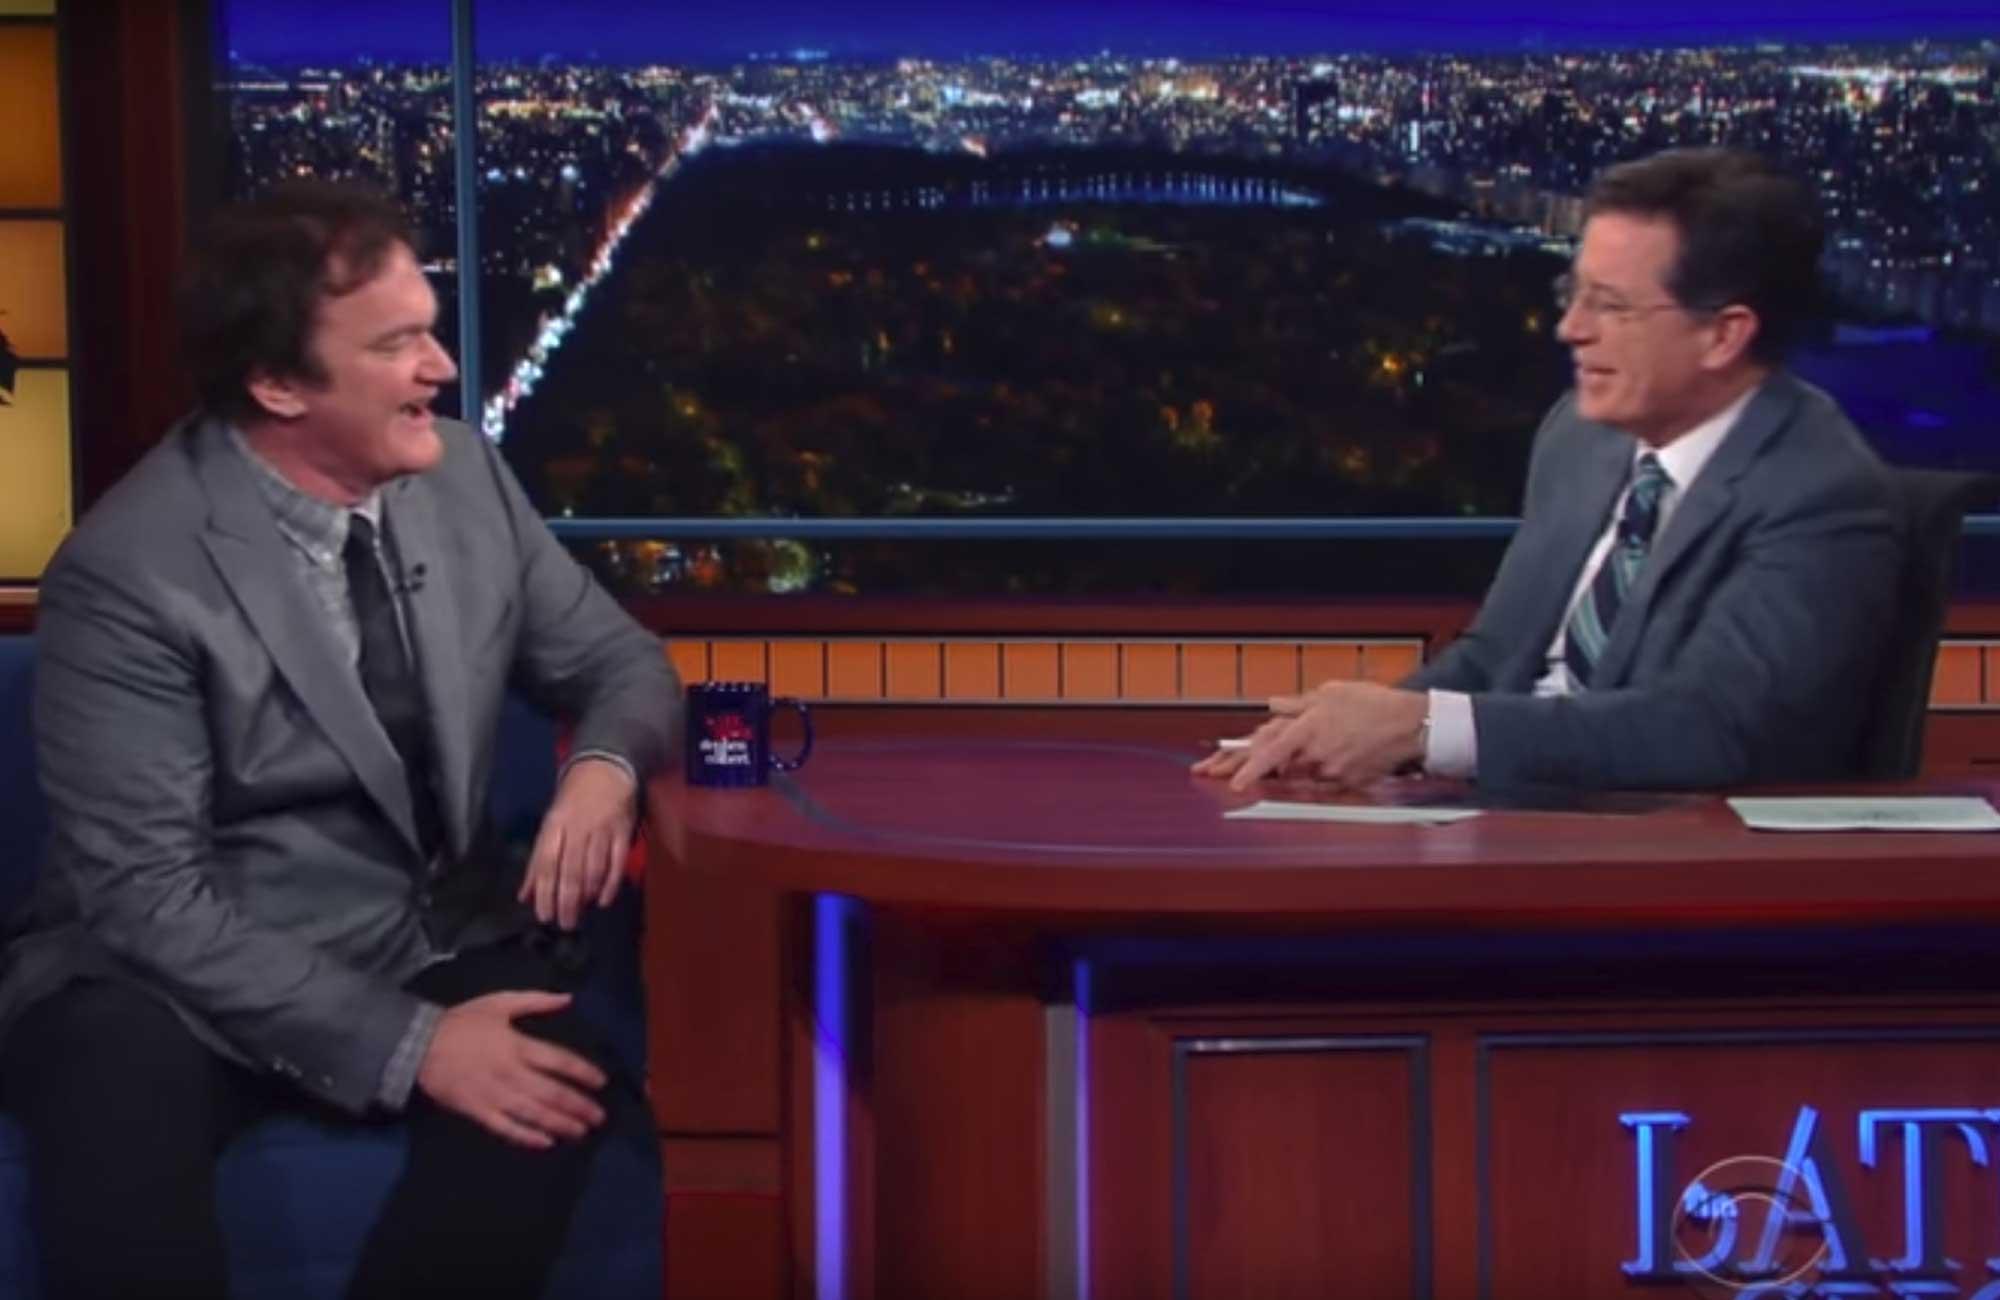 TBT: Q on Colbert